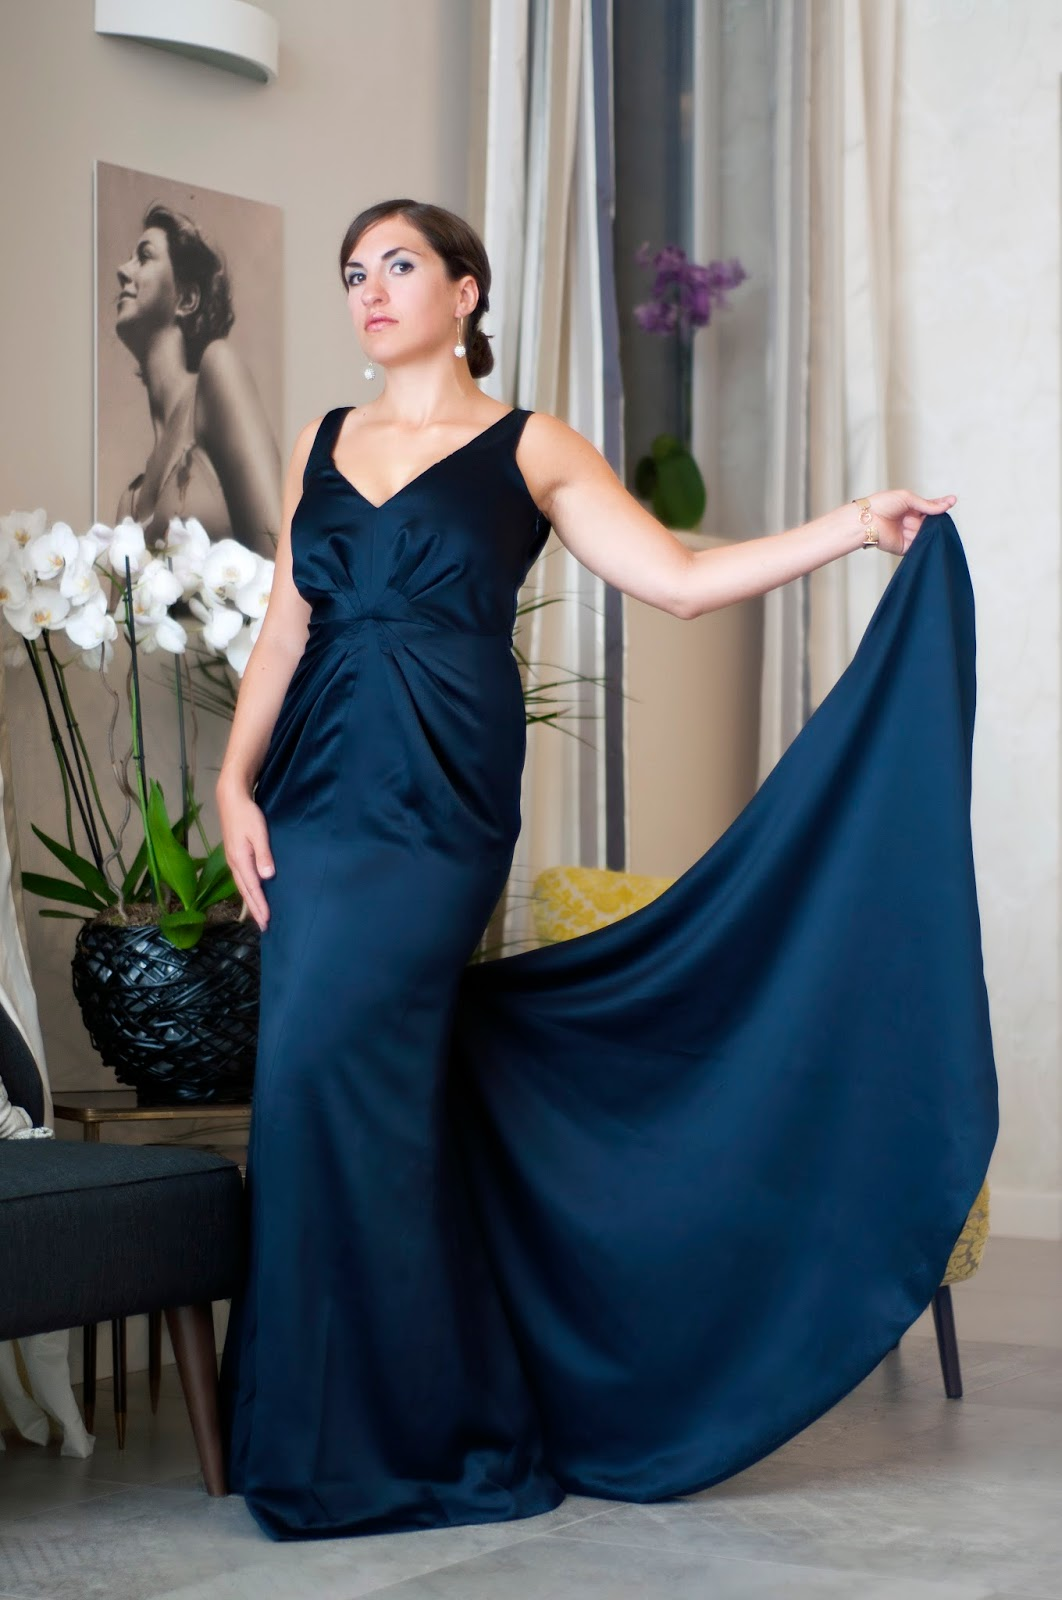 Schnittmuster Abendkleid - Burda Style #124 11/2011